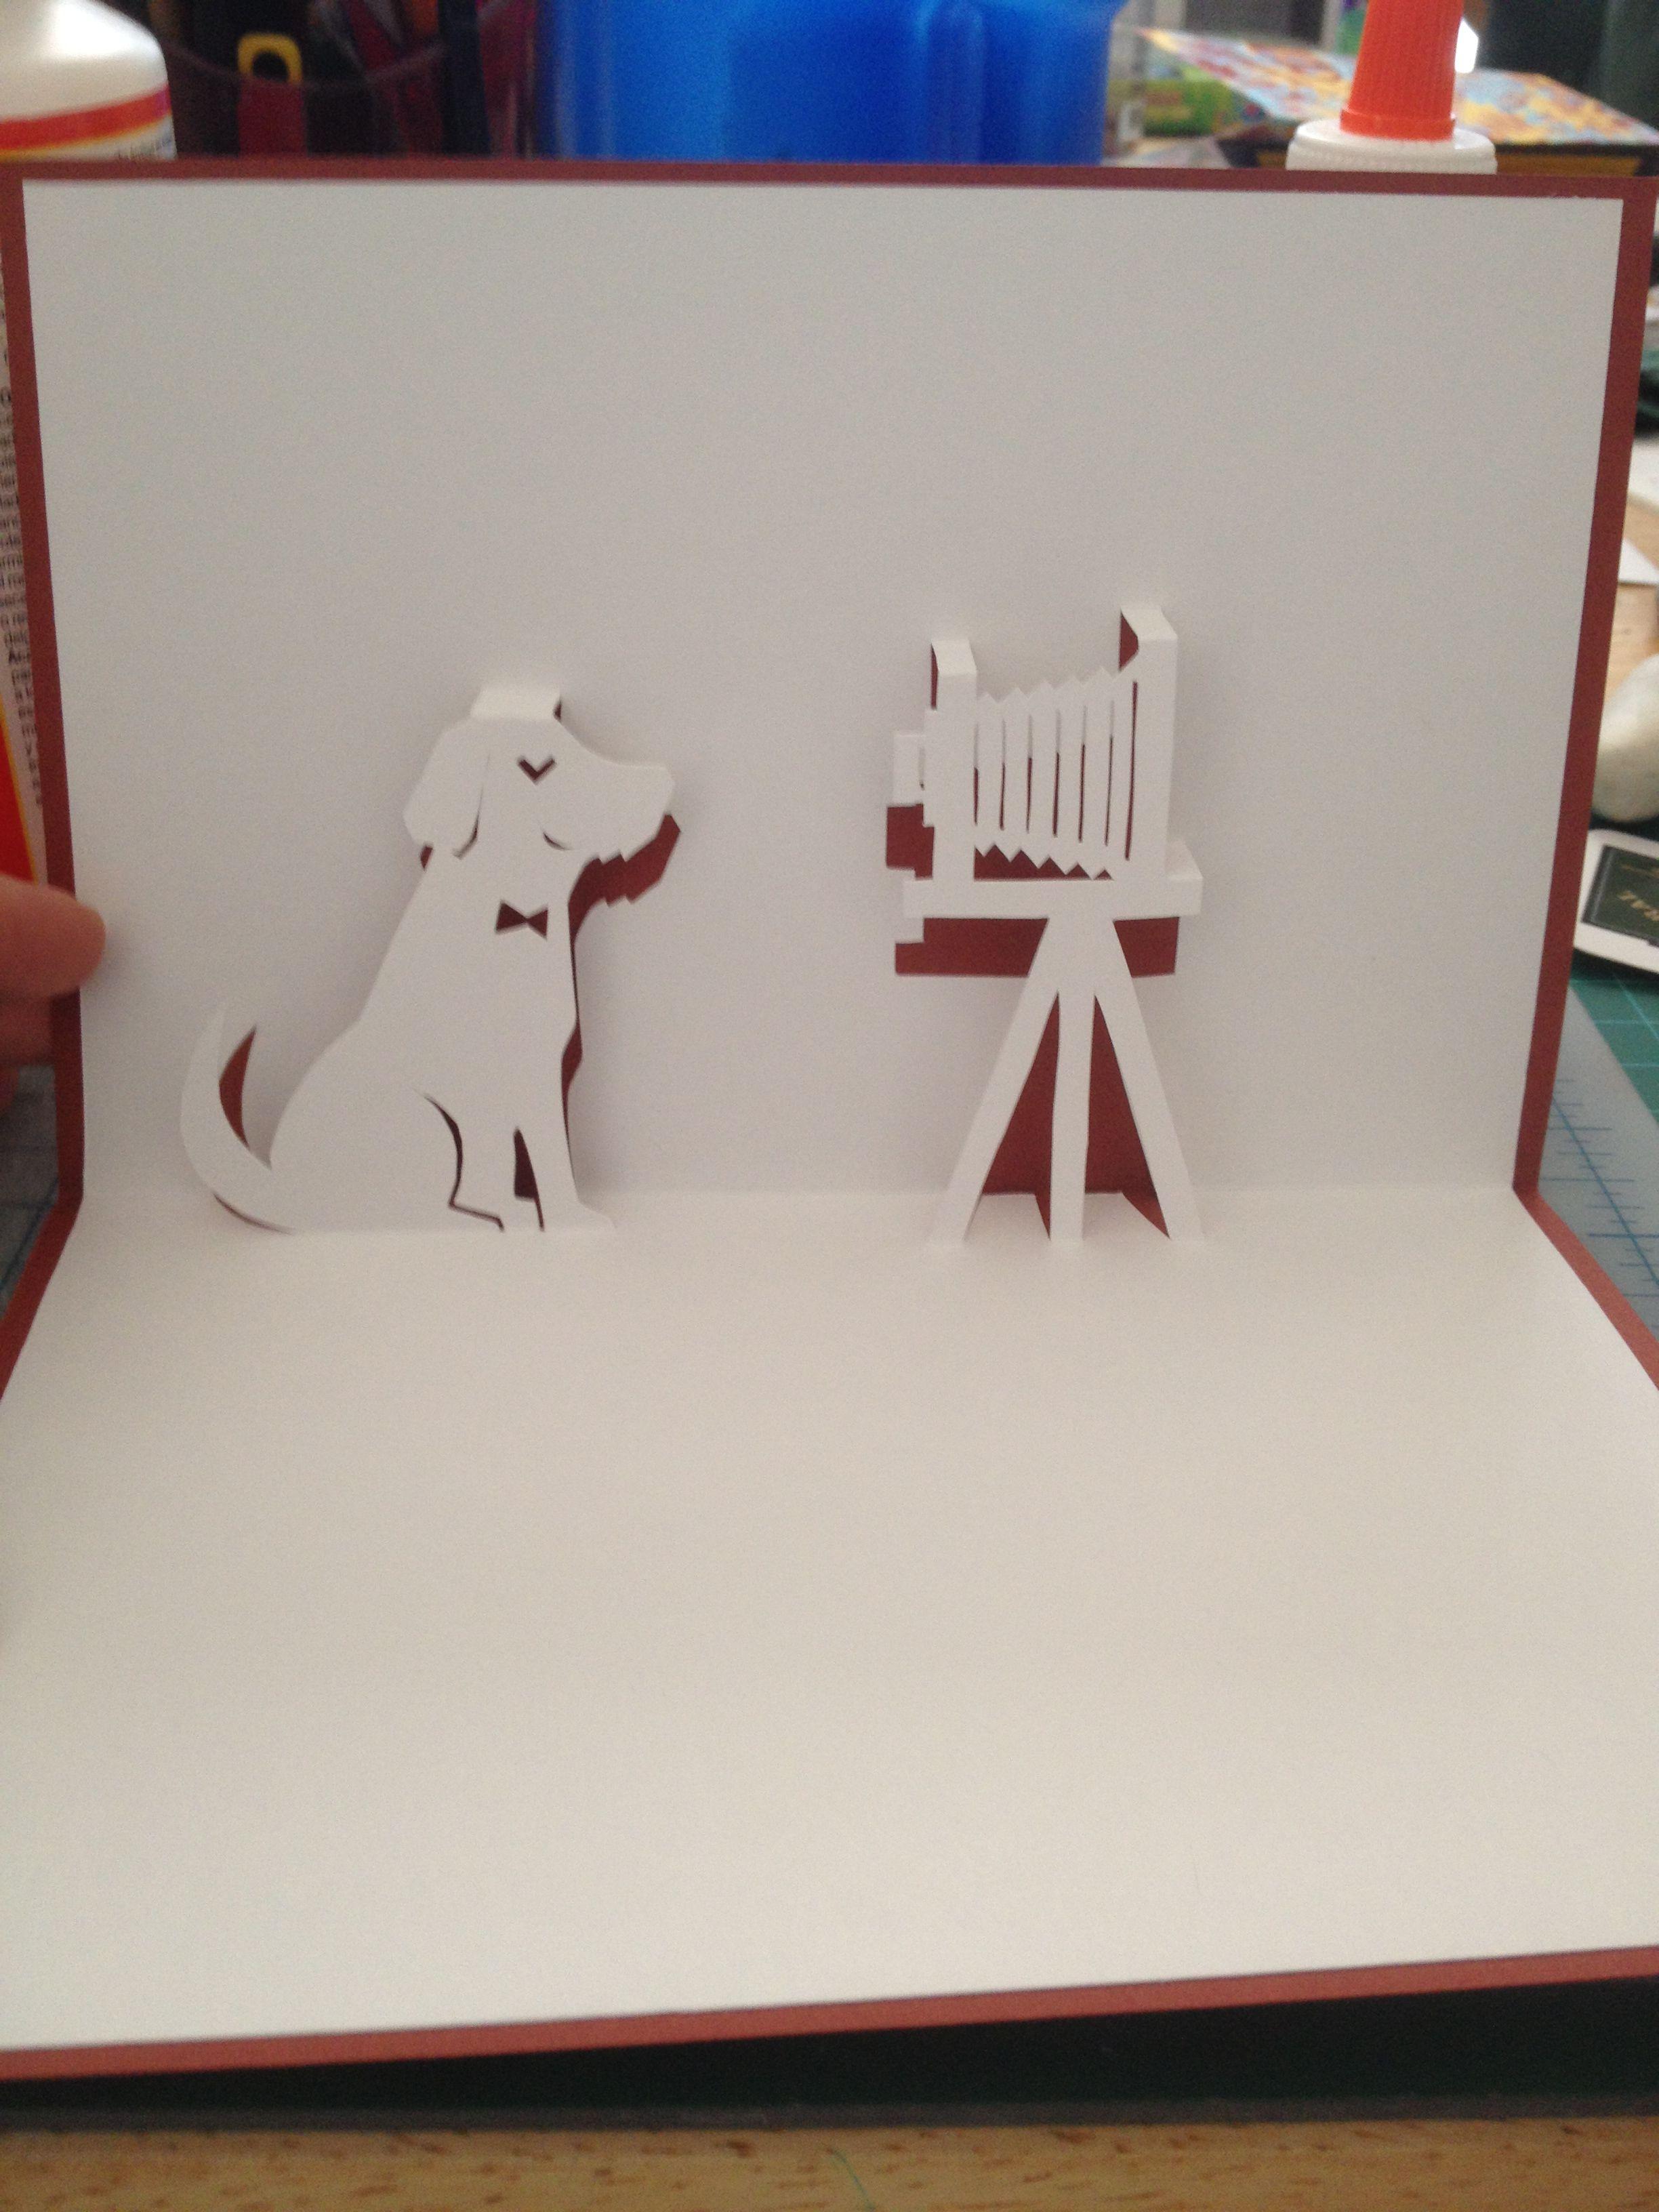 Dog Photo Shot Pop Up Card Template From Handmade Papercraft Club At Http Www5d Biglobe Ne Jp M Uet 90d Pop Up Card Templates Pop Up Cards Art Craft Cards